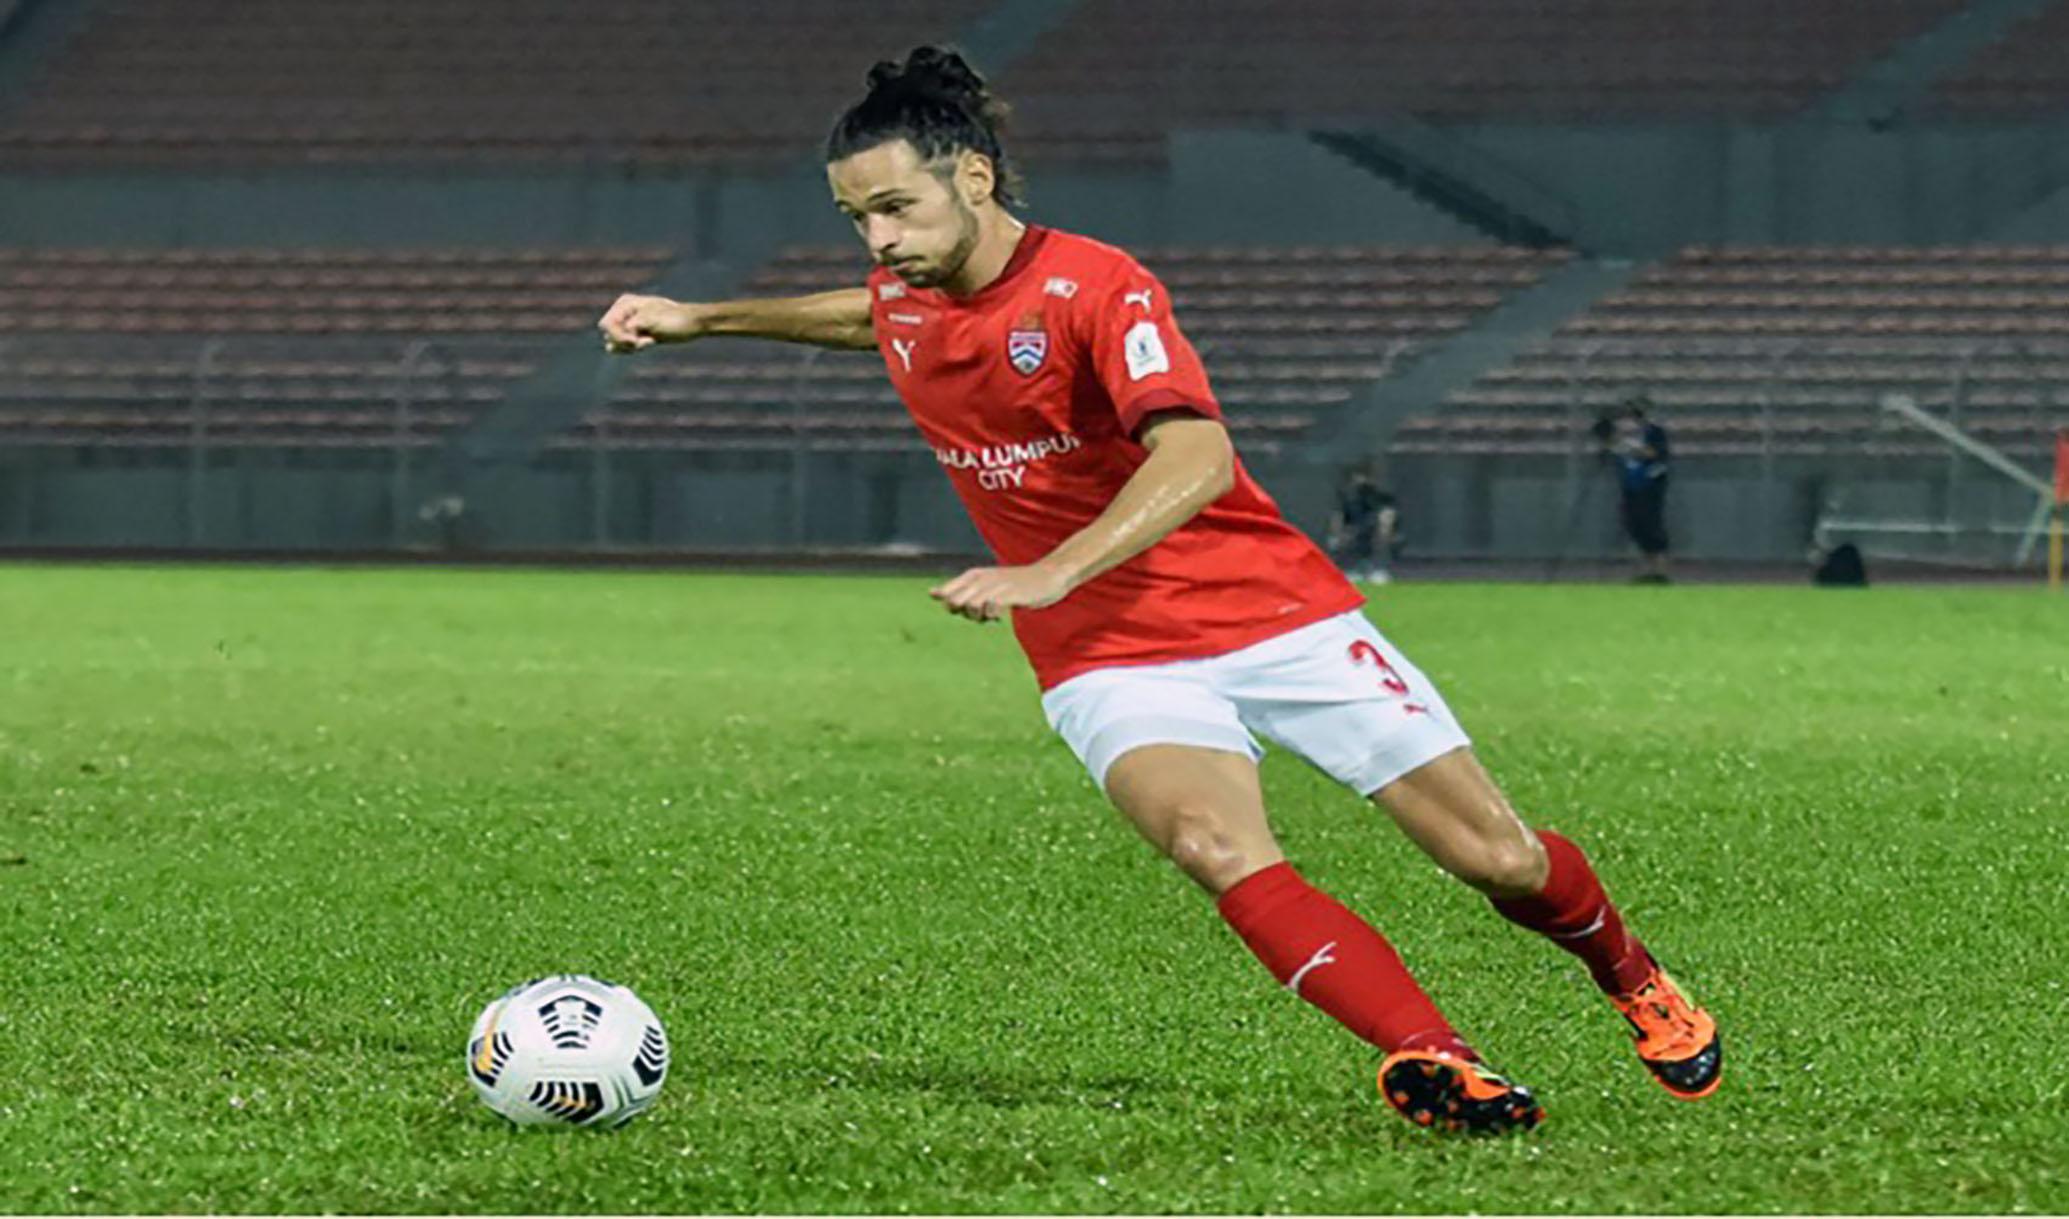 Former Pupil Daniel Ting Shines in Malaysian Super League Football thumbnail image